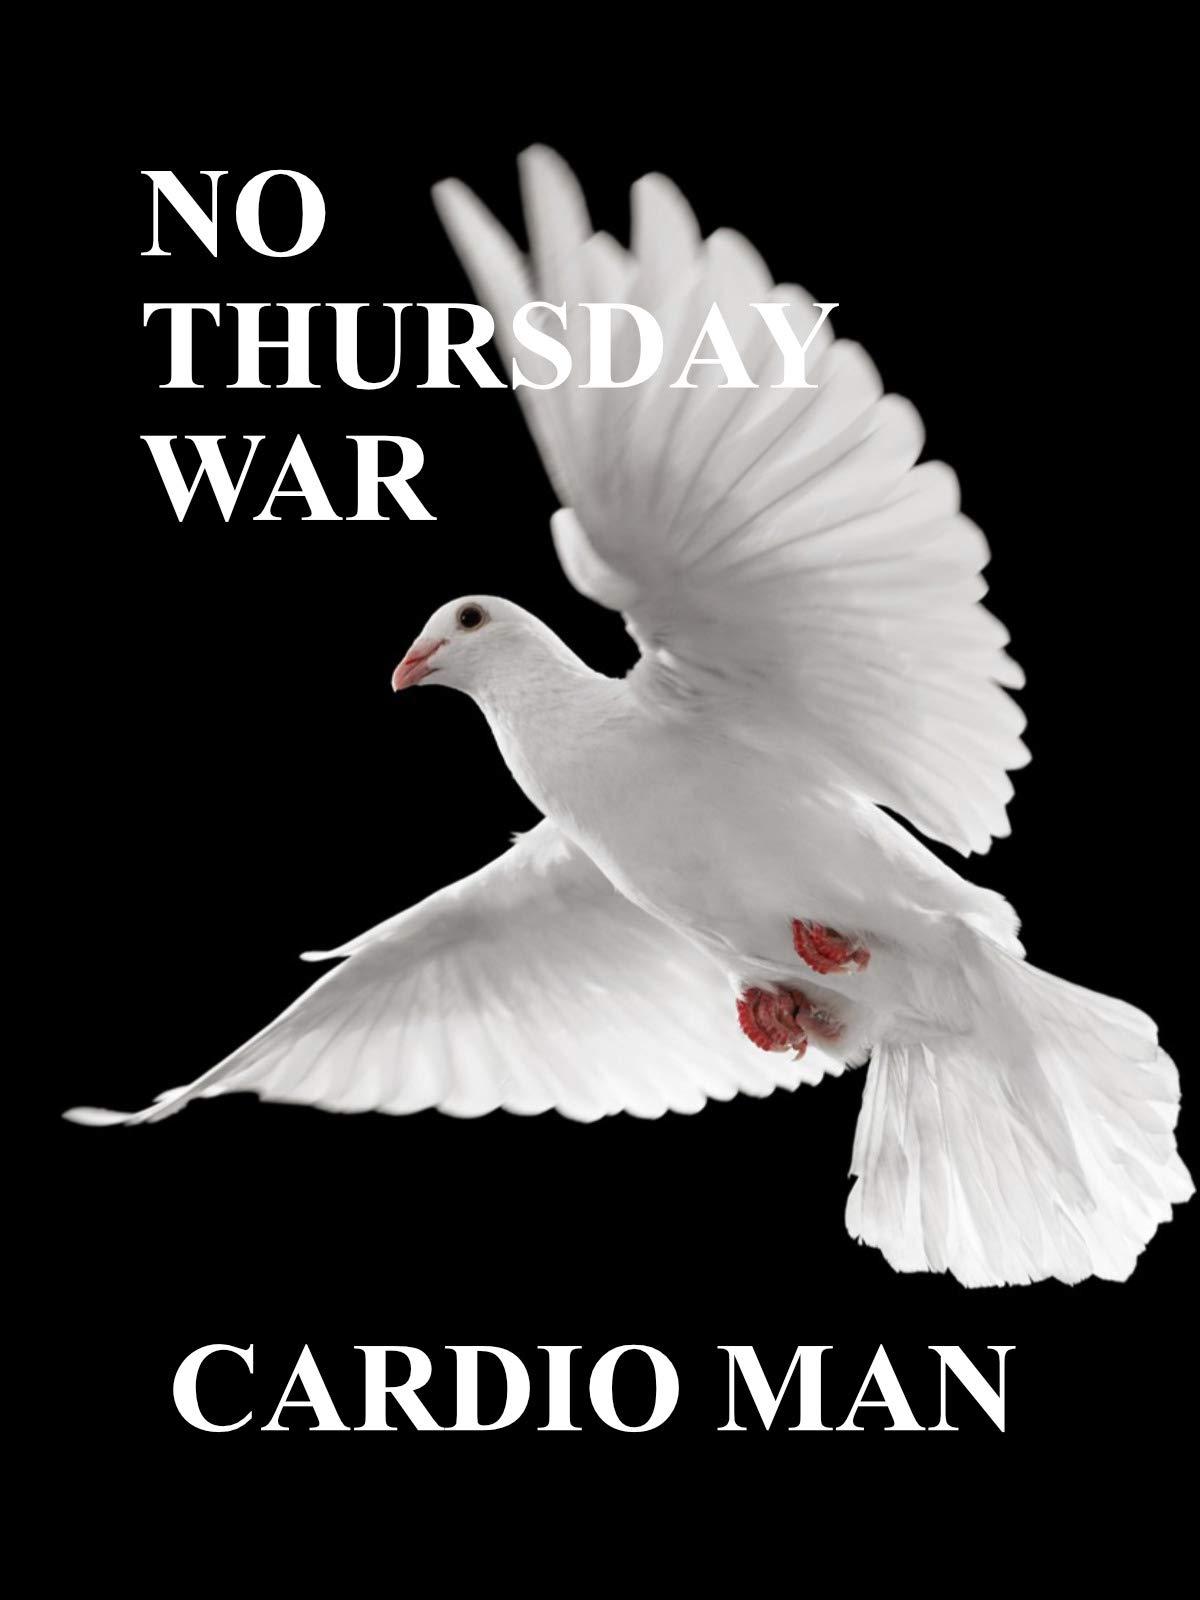 Cardio Man